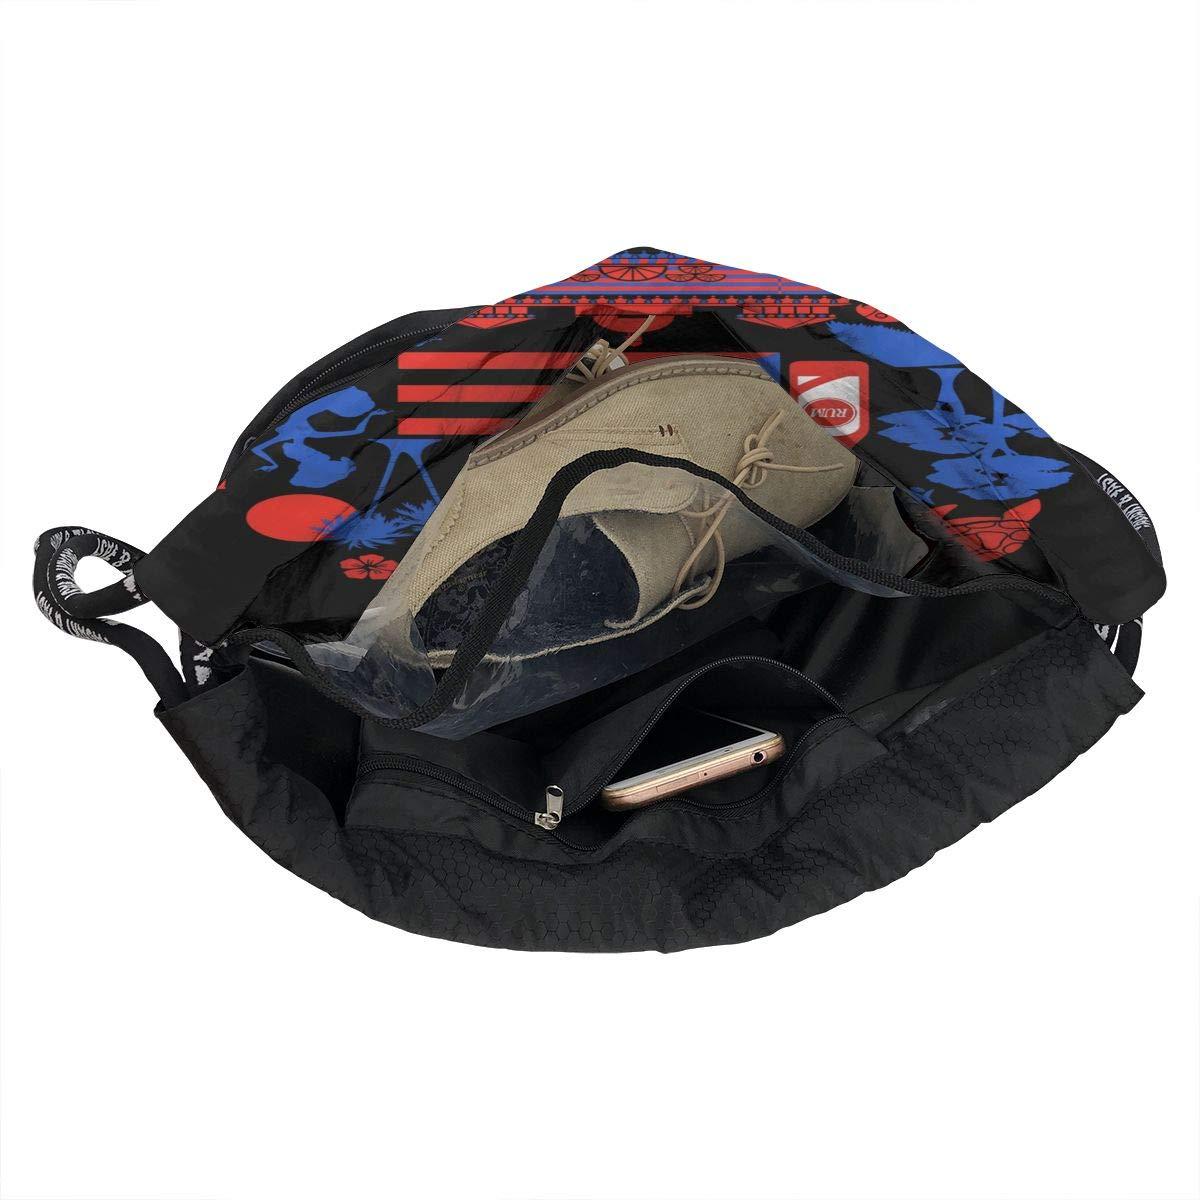 Puerto Rico Icon Drawstring Bag Multifunctional String Backpack Custom Cinch Backpack Rucksack Gym Bag